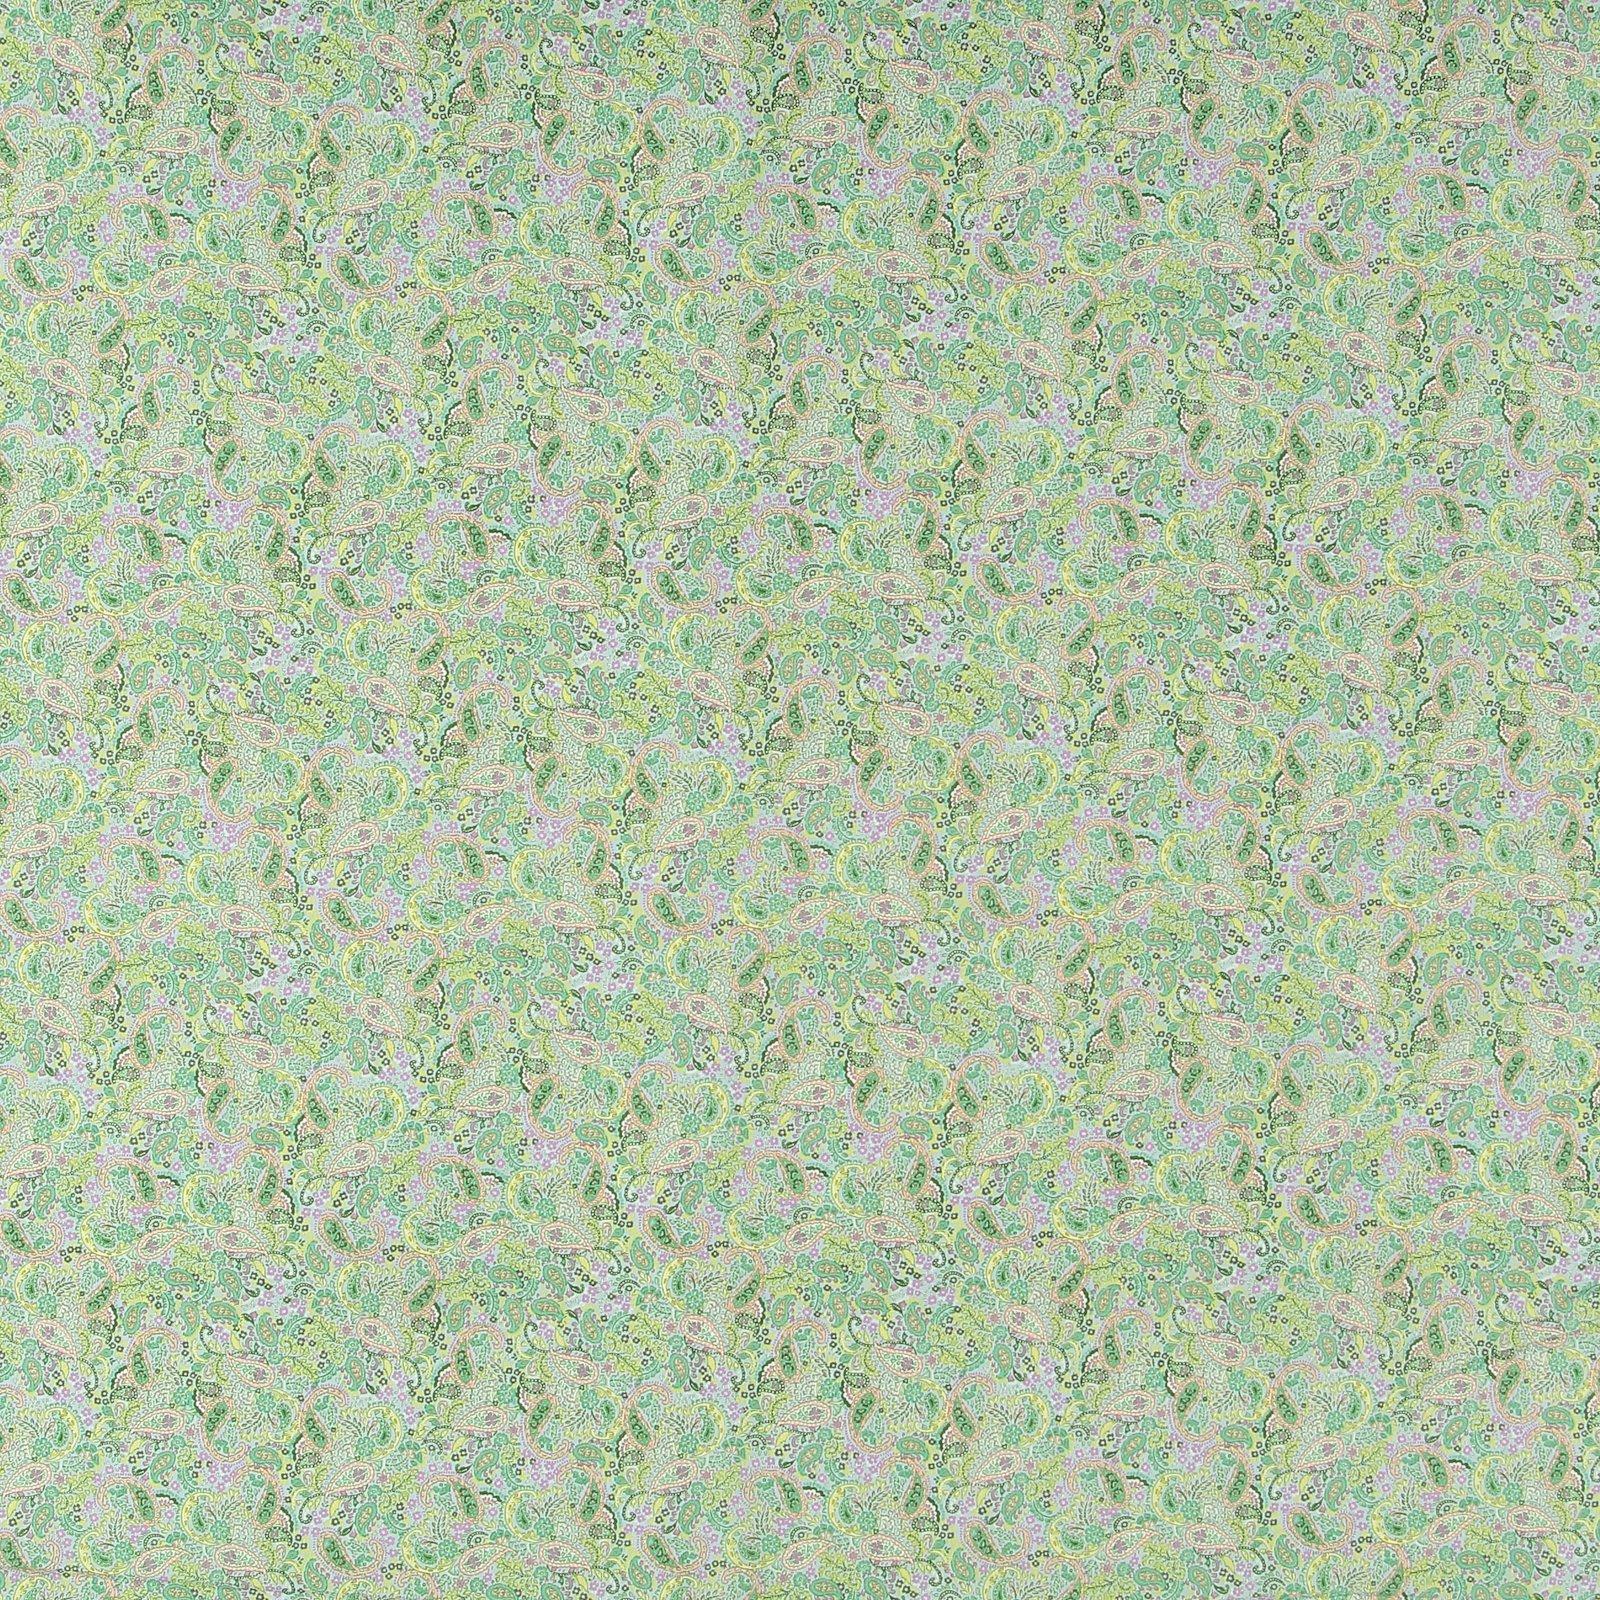 Cotton light blue and mint paisley 852367_pack_sp